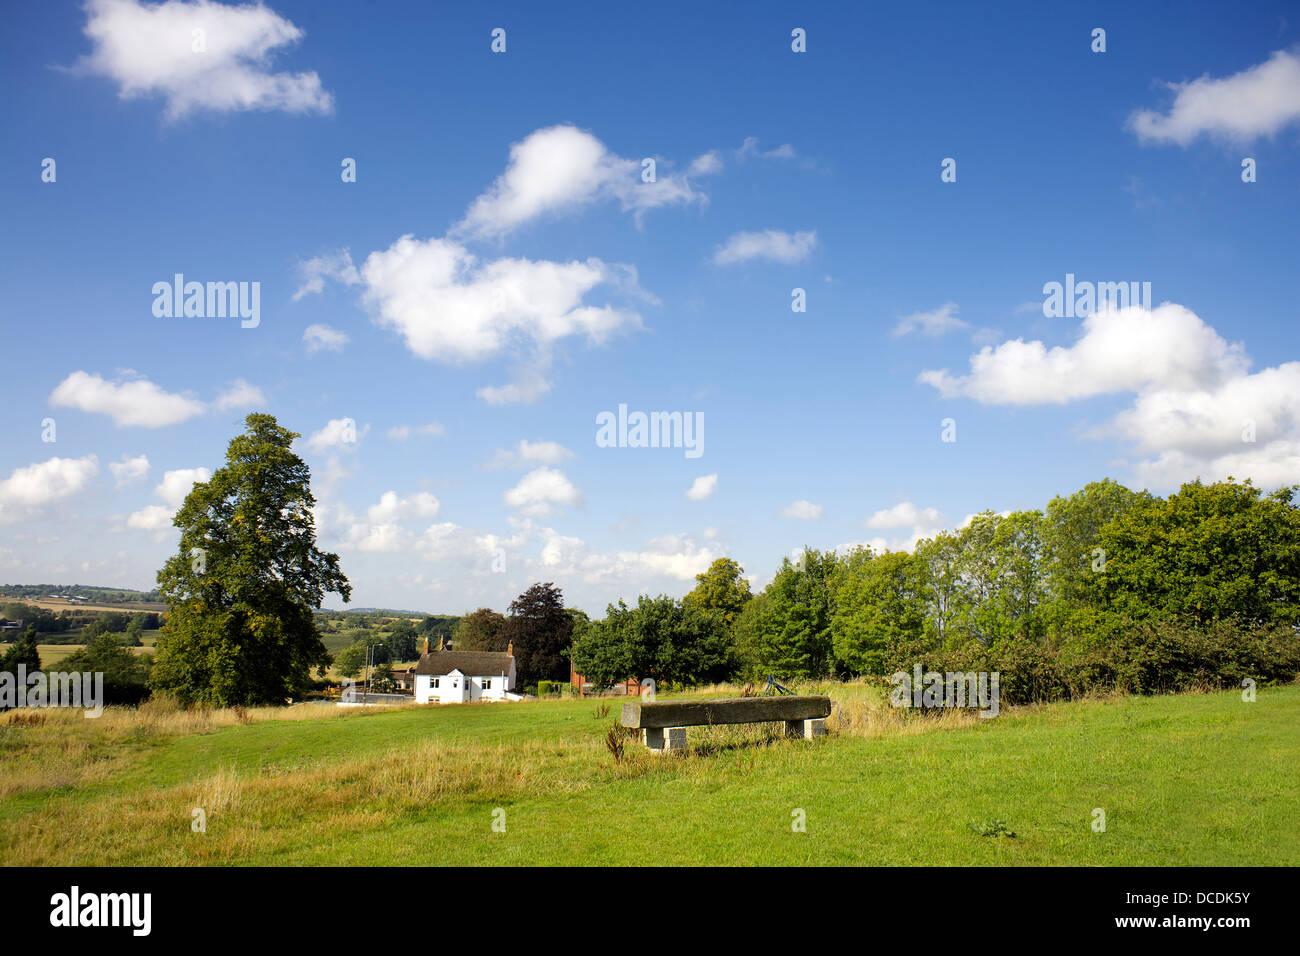 Braunston village Northamptonshire Northants England UK GB field charming pretty quaint rural England country life - Stock Image